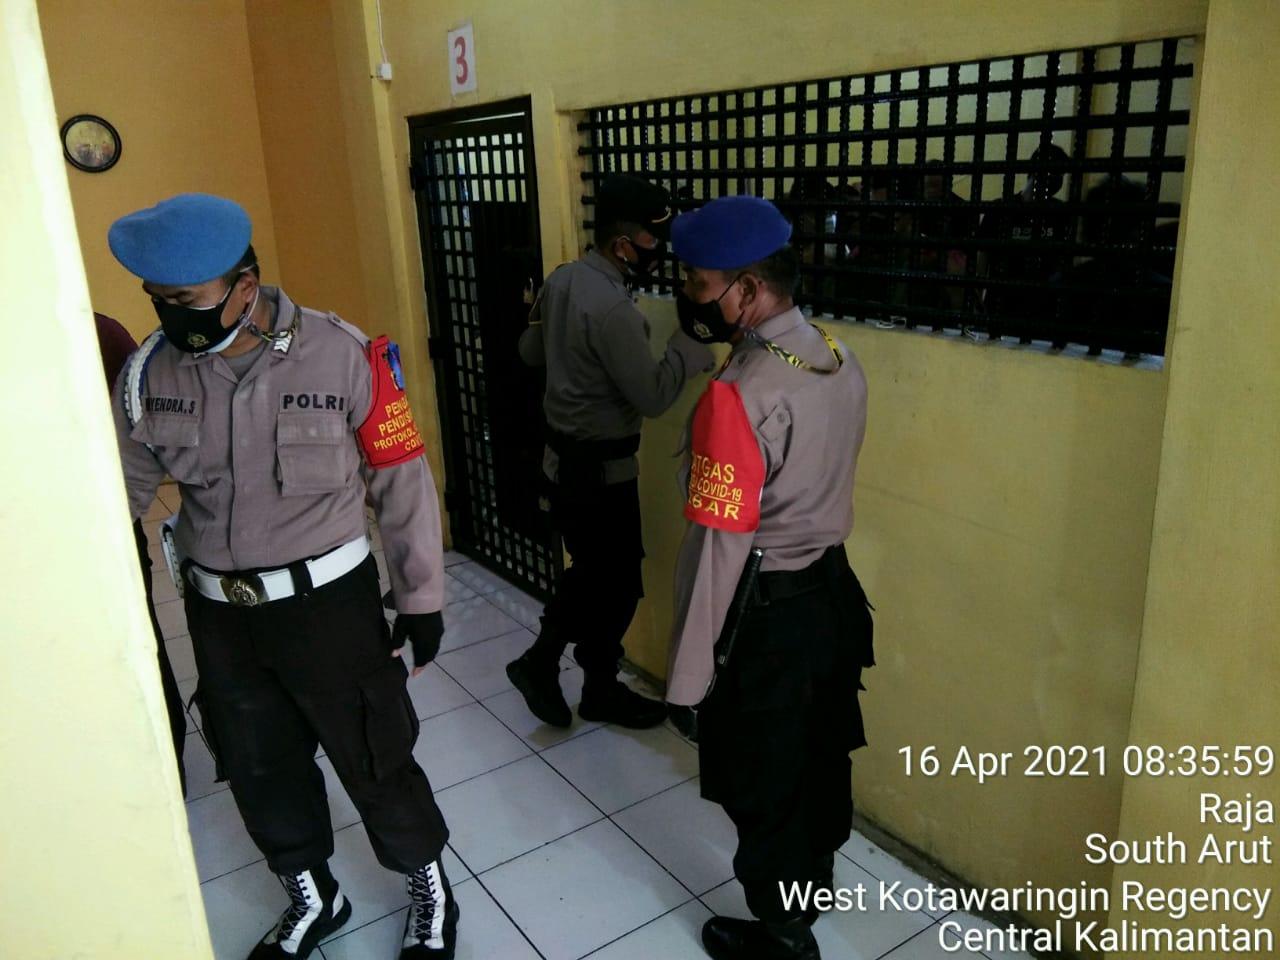 Agenda Rutin, Cek Ruang Tahanan